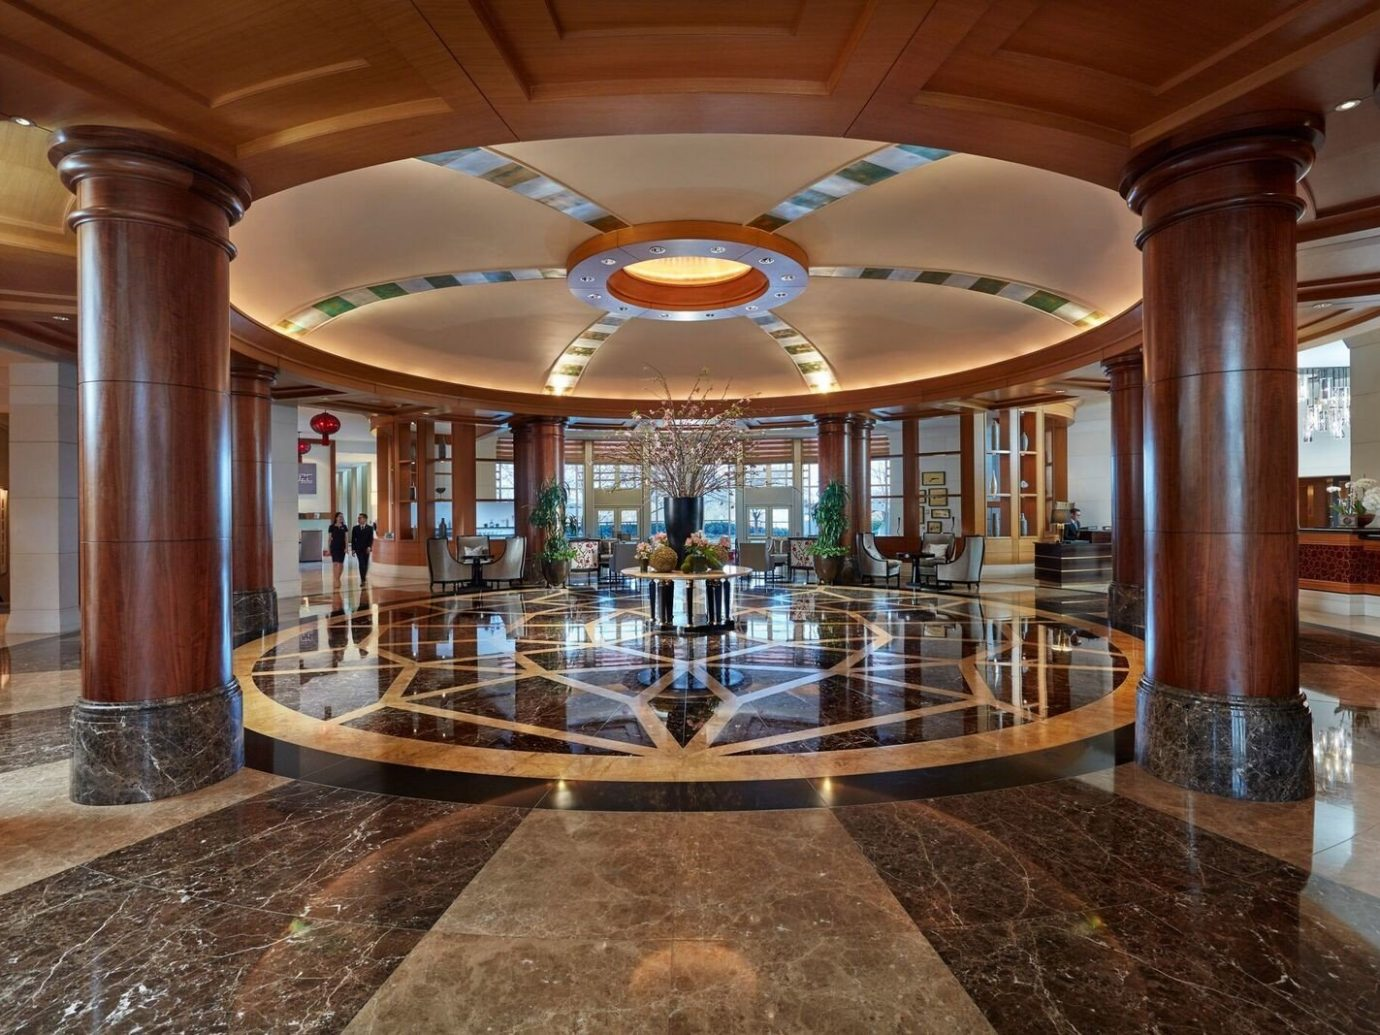 Hotels ceiling indoor Lobby building estate interior design real estate hall furniture